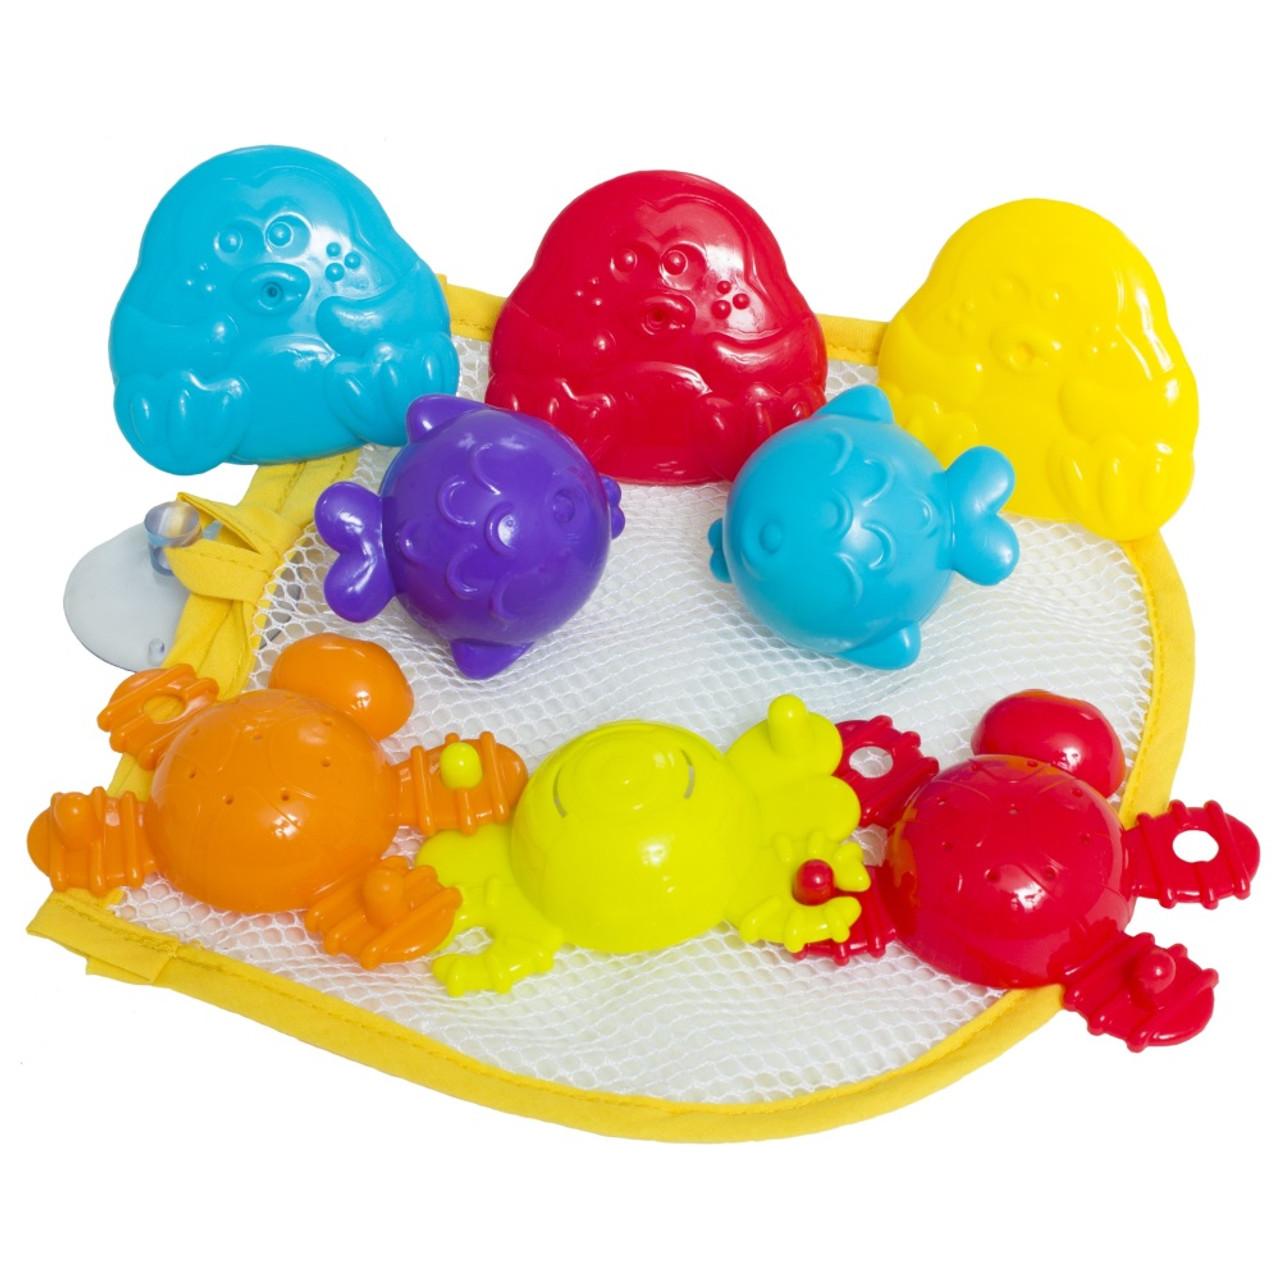 Playgro Splash in The Tub Fun Set